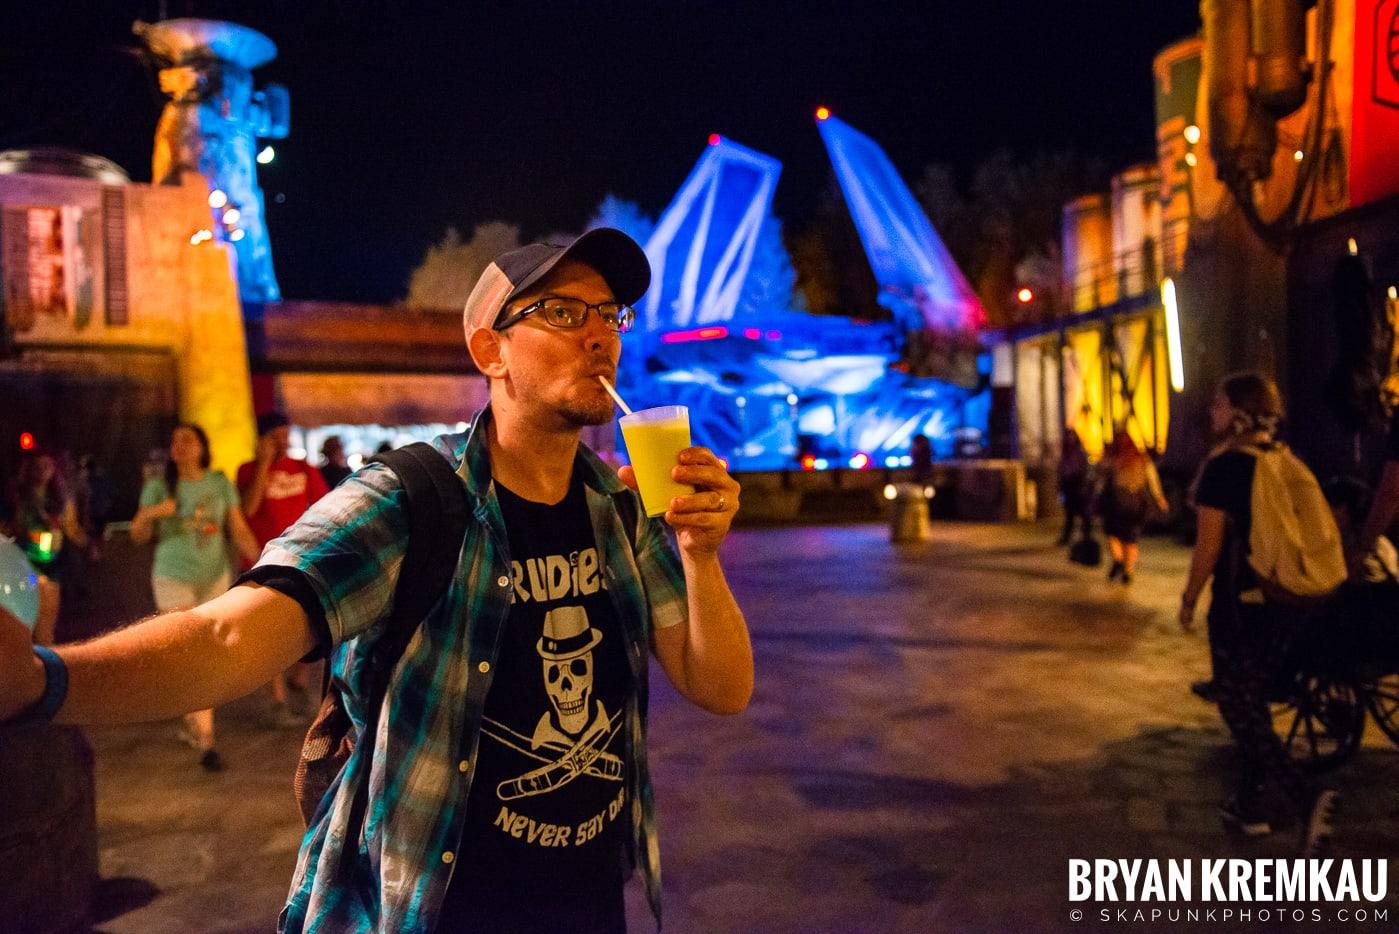 Walt Disney World Vacation: Day 5 (Animal Kingdom / Disney's Hollywood Studios) - 10.3.19 (4)